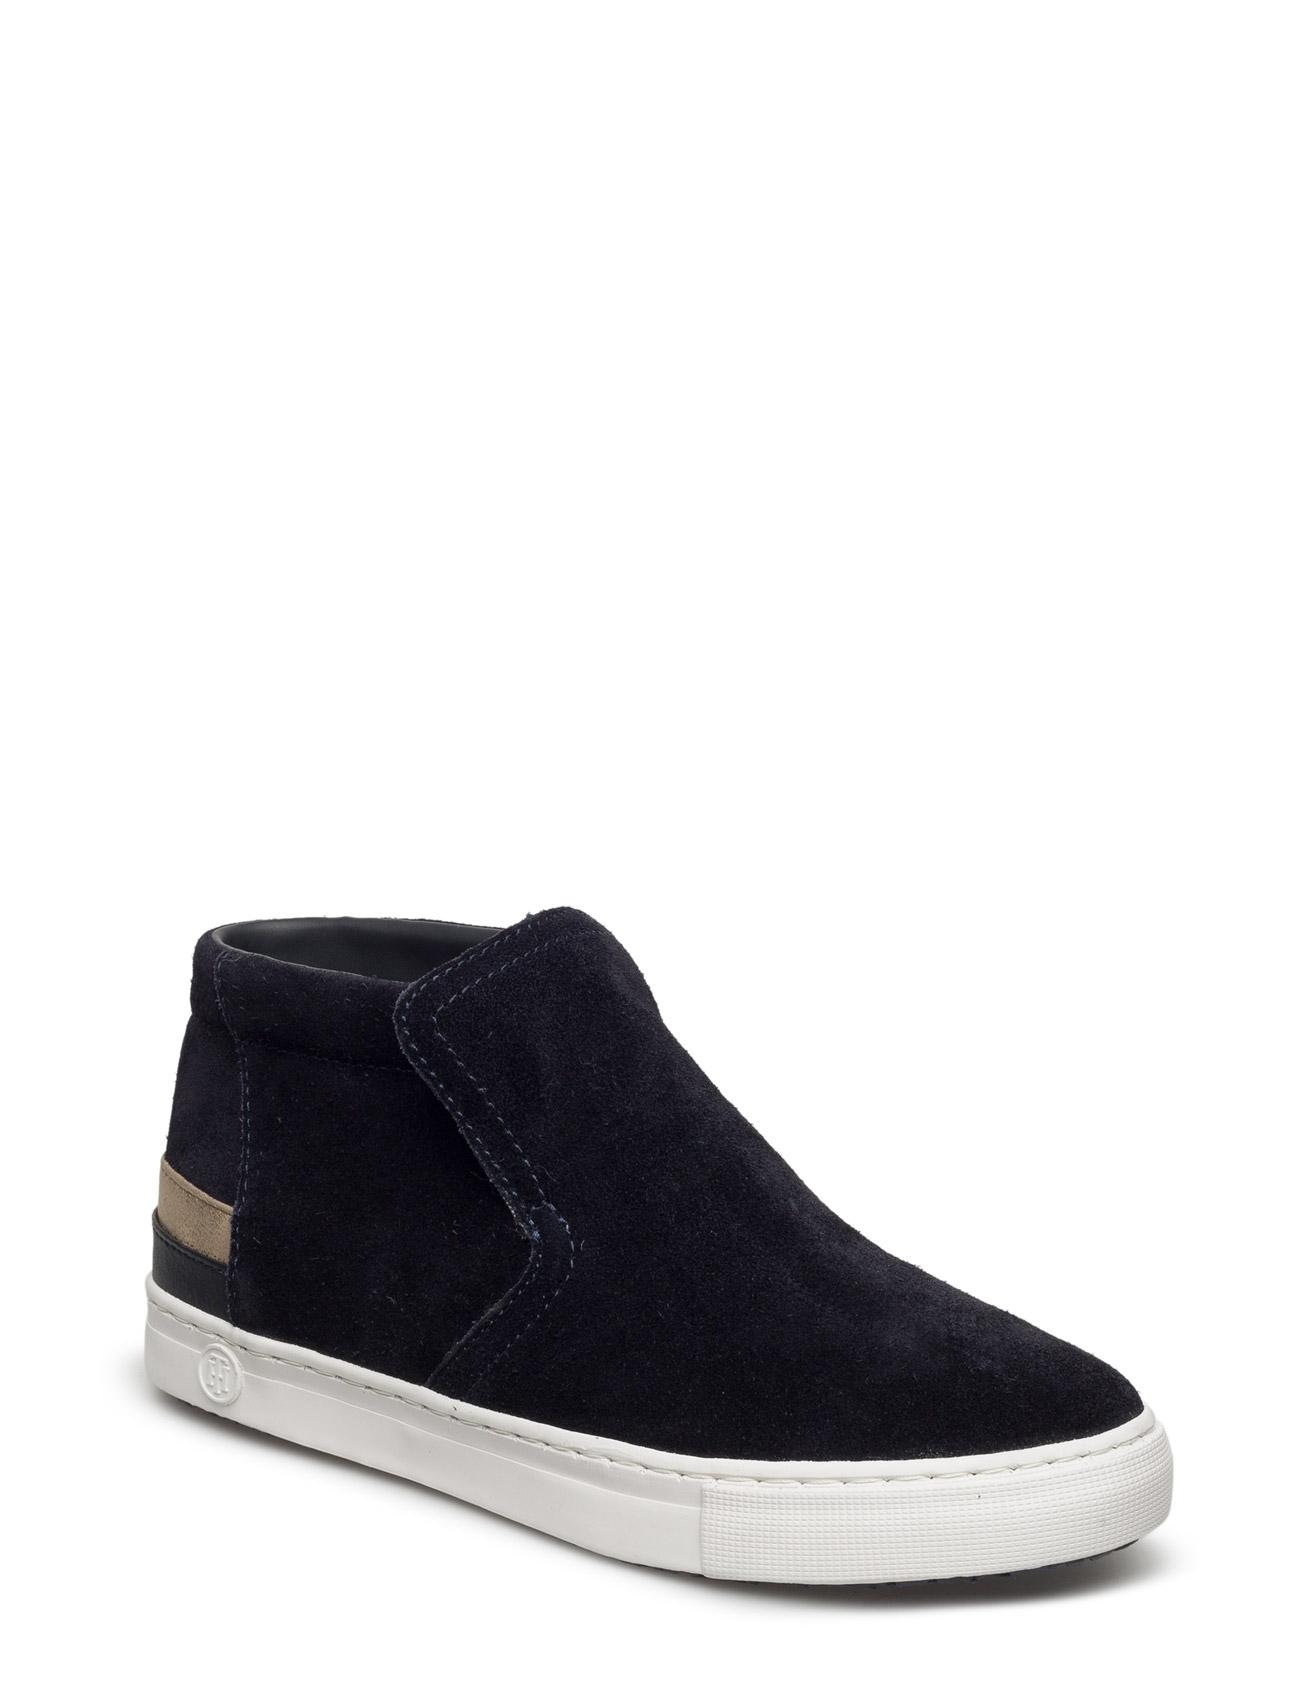 J1285eanne 4b Tommy Hilfiger Sneakers til Damer i Midnight blå